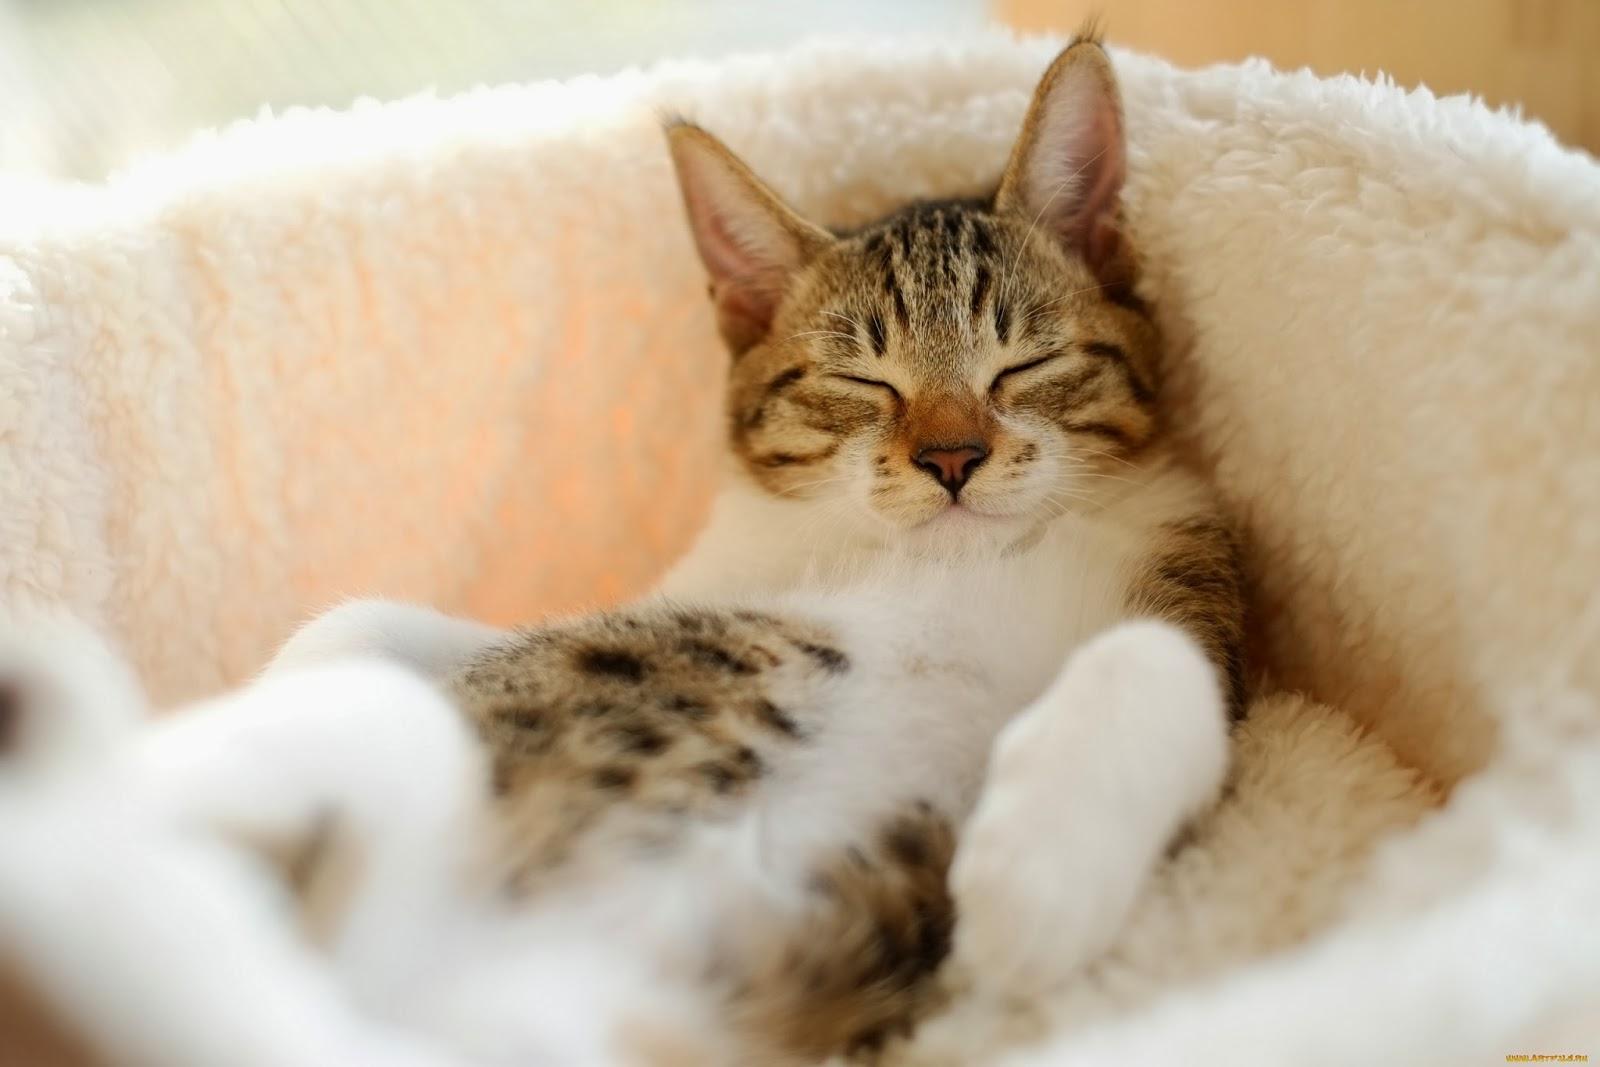 cute cats Download Sleeping cat wallpaper Sleeping cat wallpaper 1600x1067